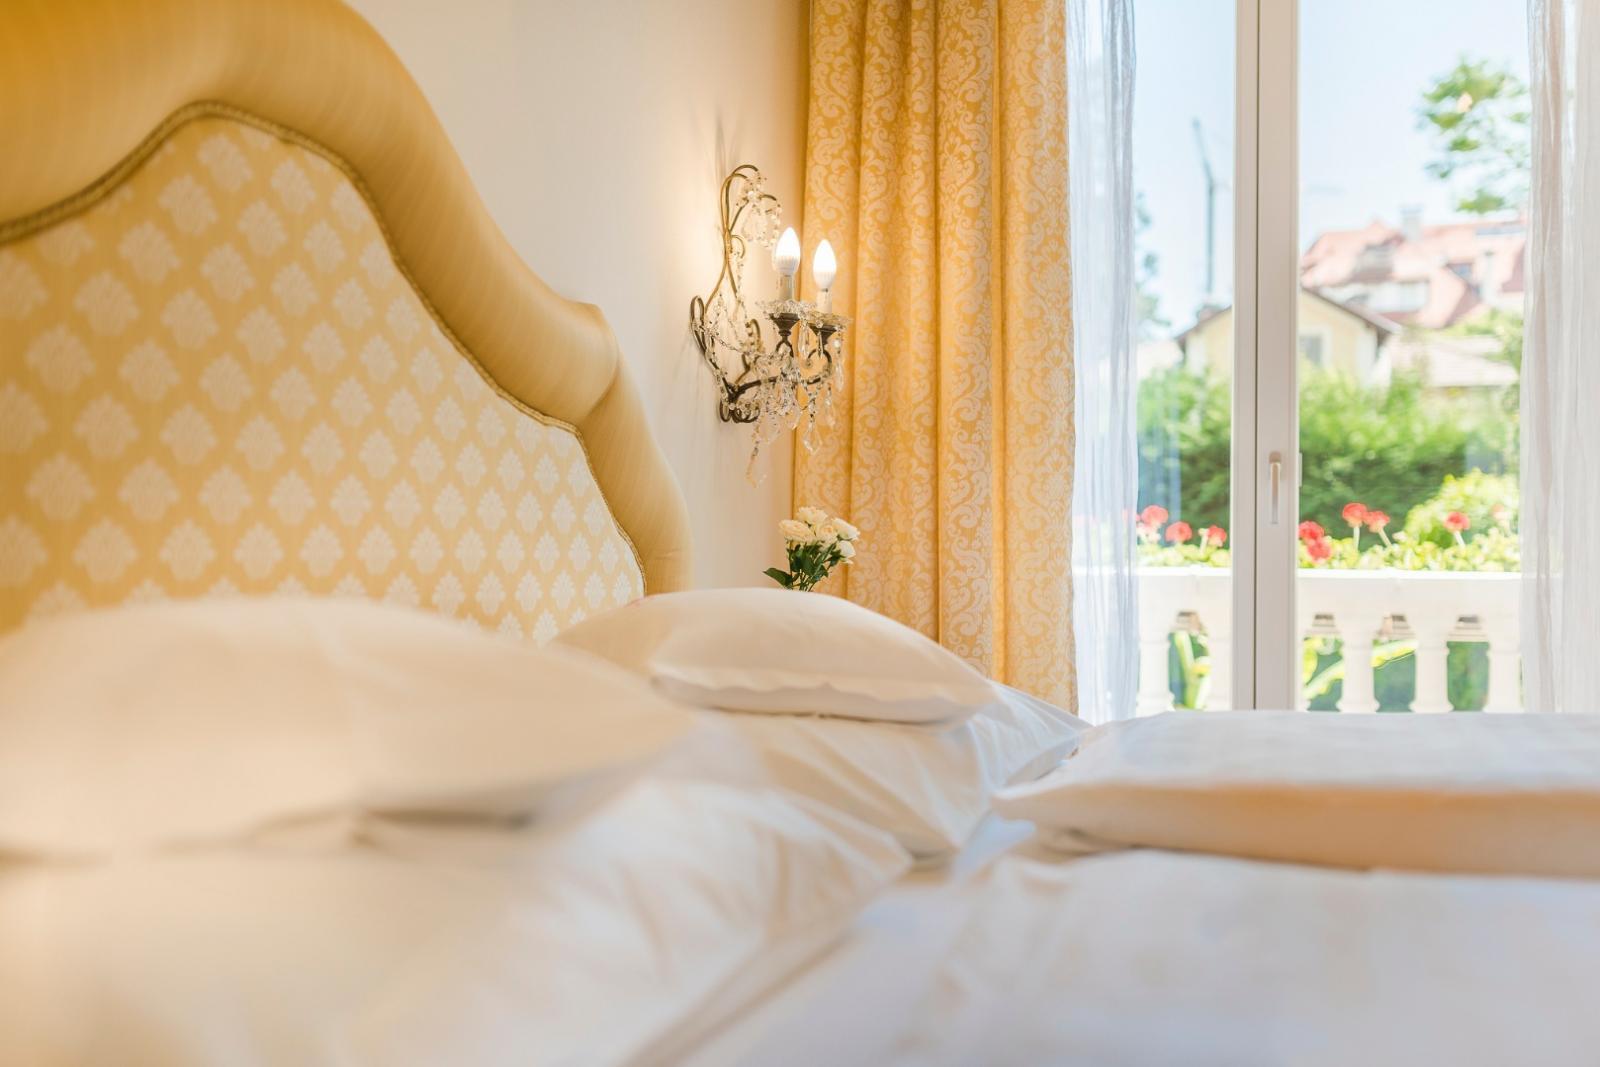 Magnetfeldtherapie: Foto vom Wellnesshotel Hotel Adria & SPA   Wellness Südtirol